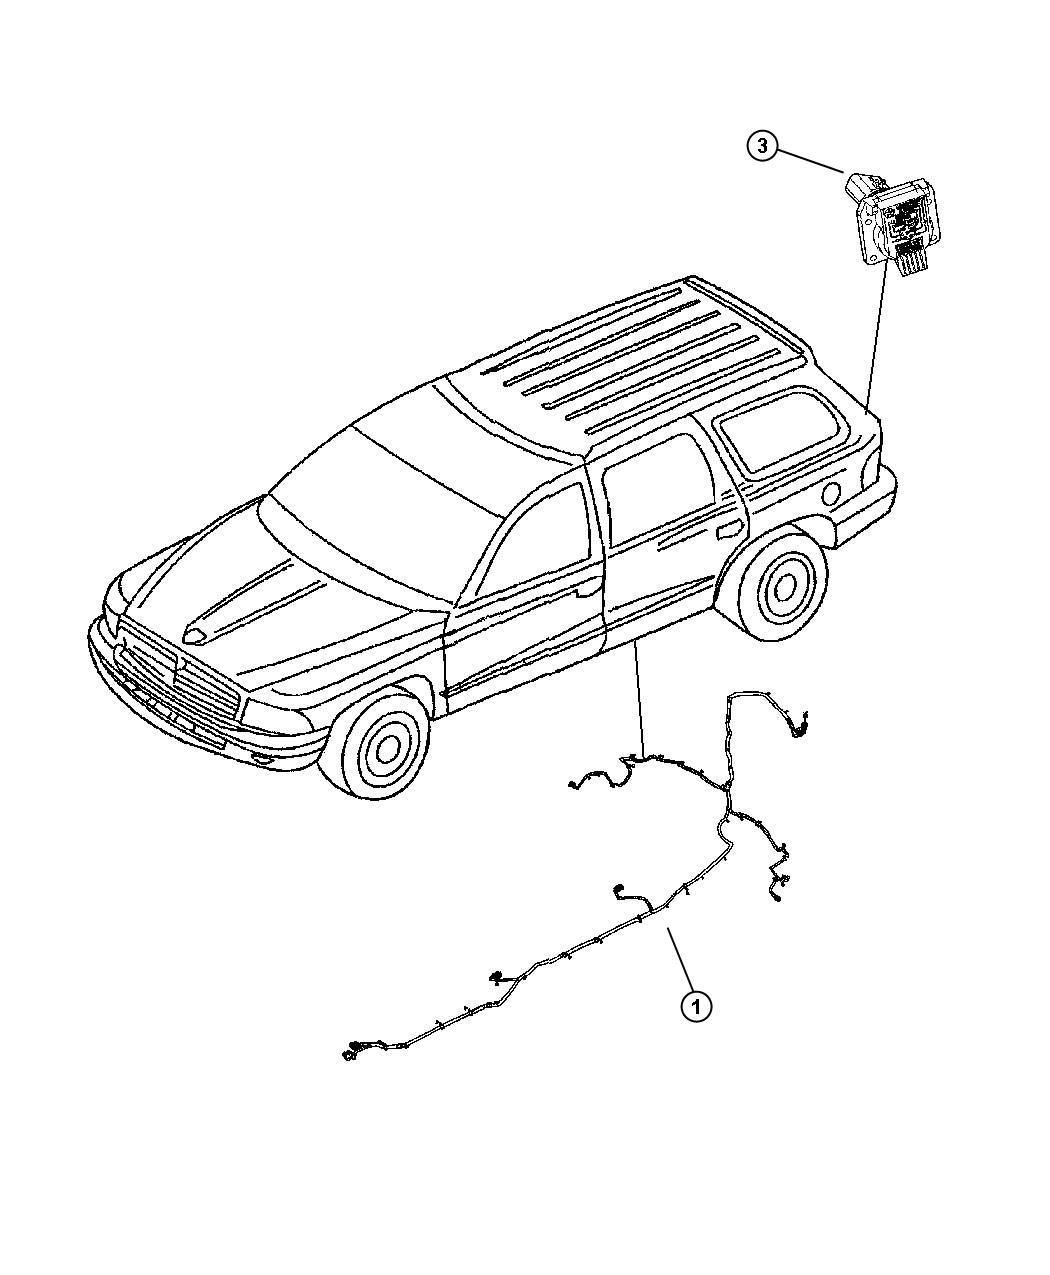 [DIAGRAM] 1977 Dodge Aspen Wiring Diagram FULL Version HD